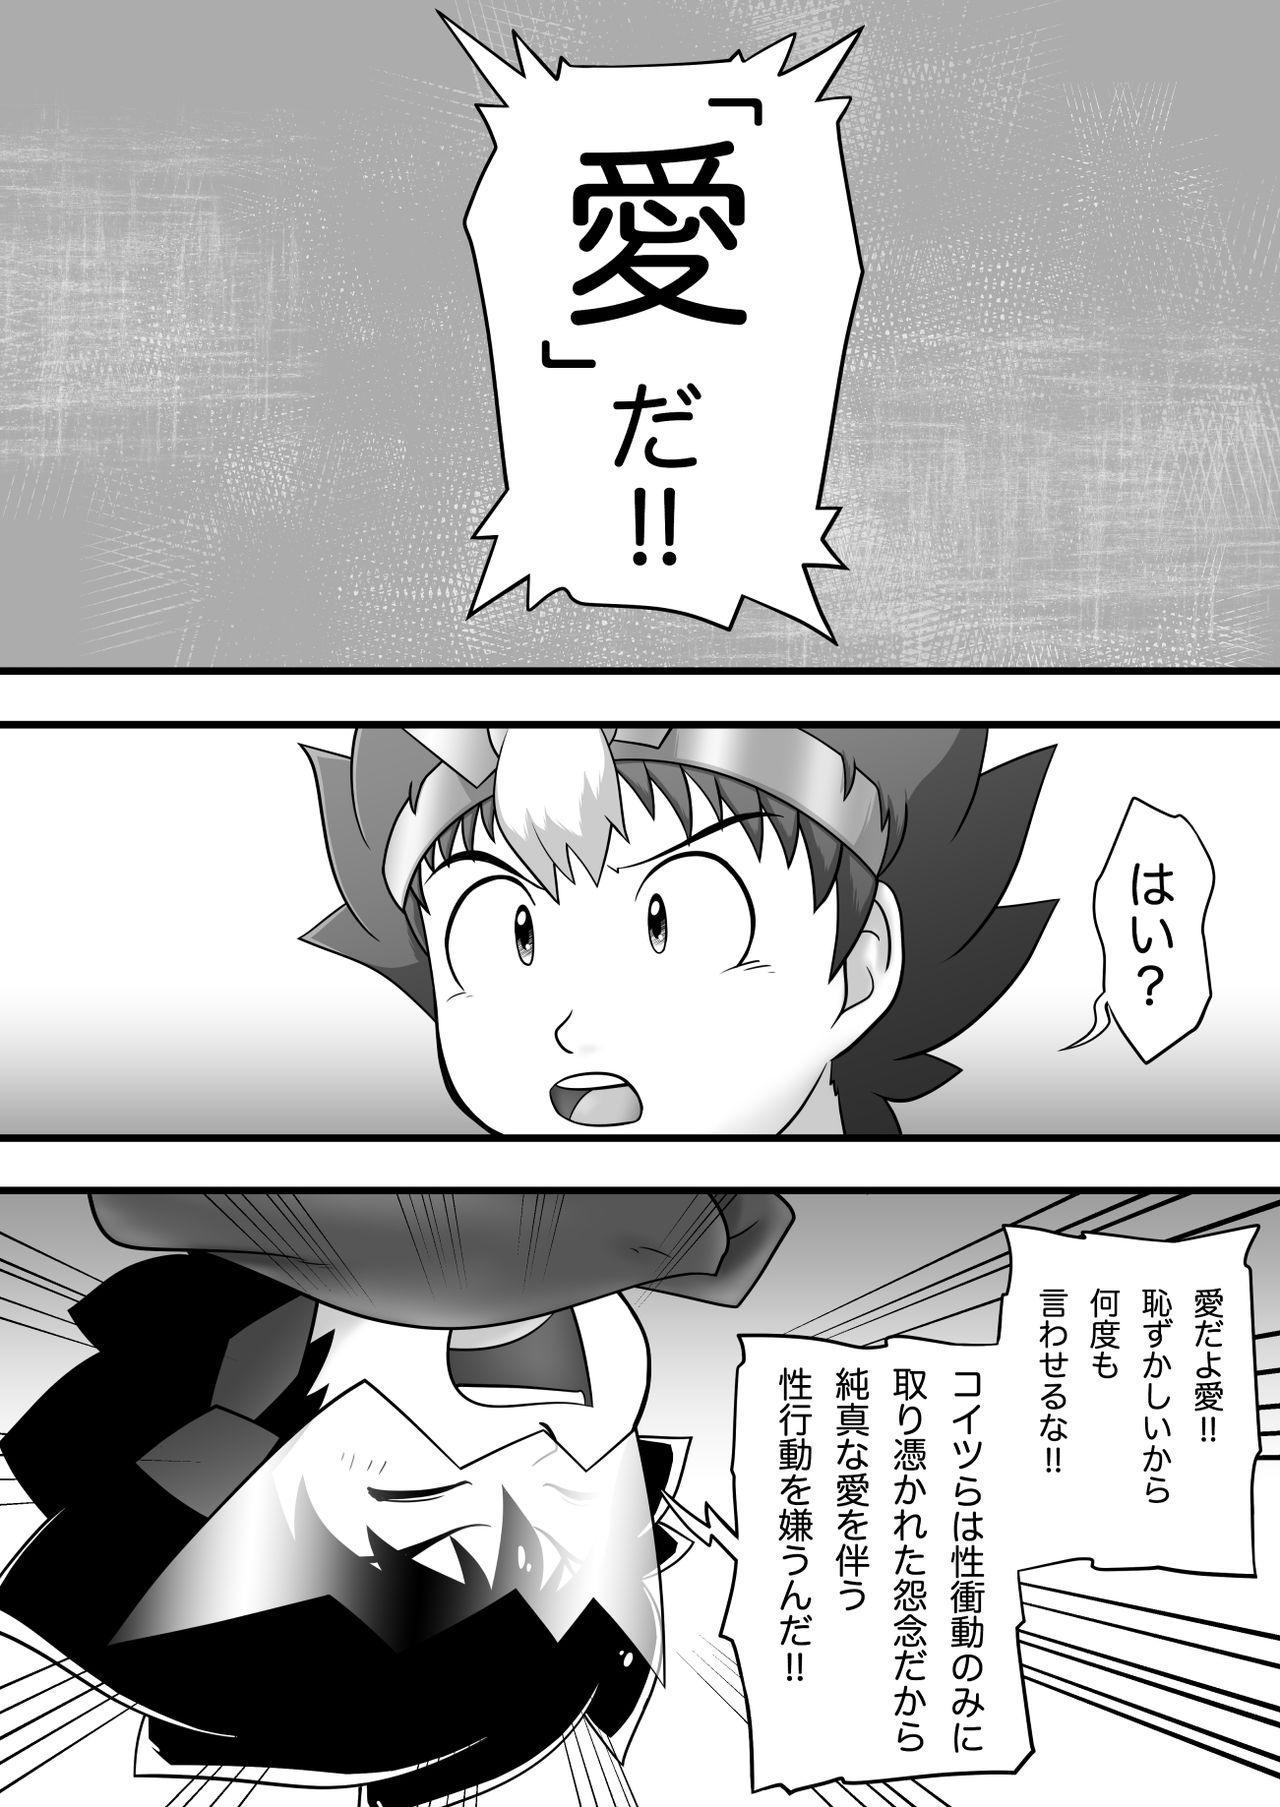 Chrono Kid TSURUGI VS Enboy 25